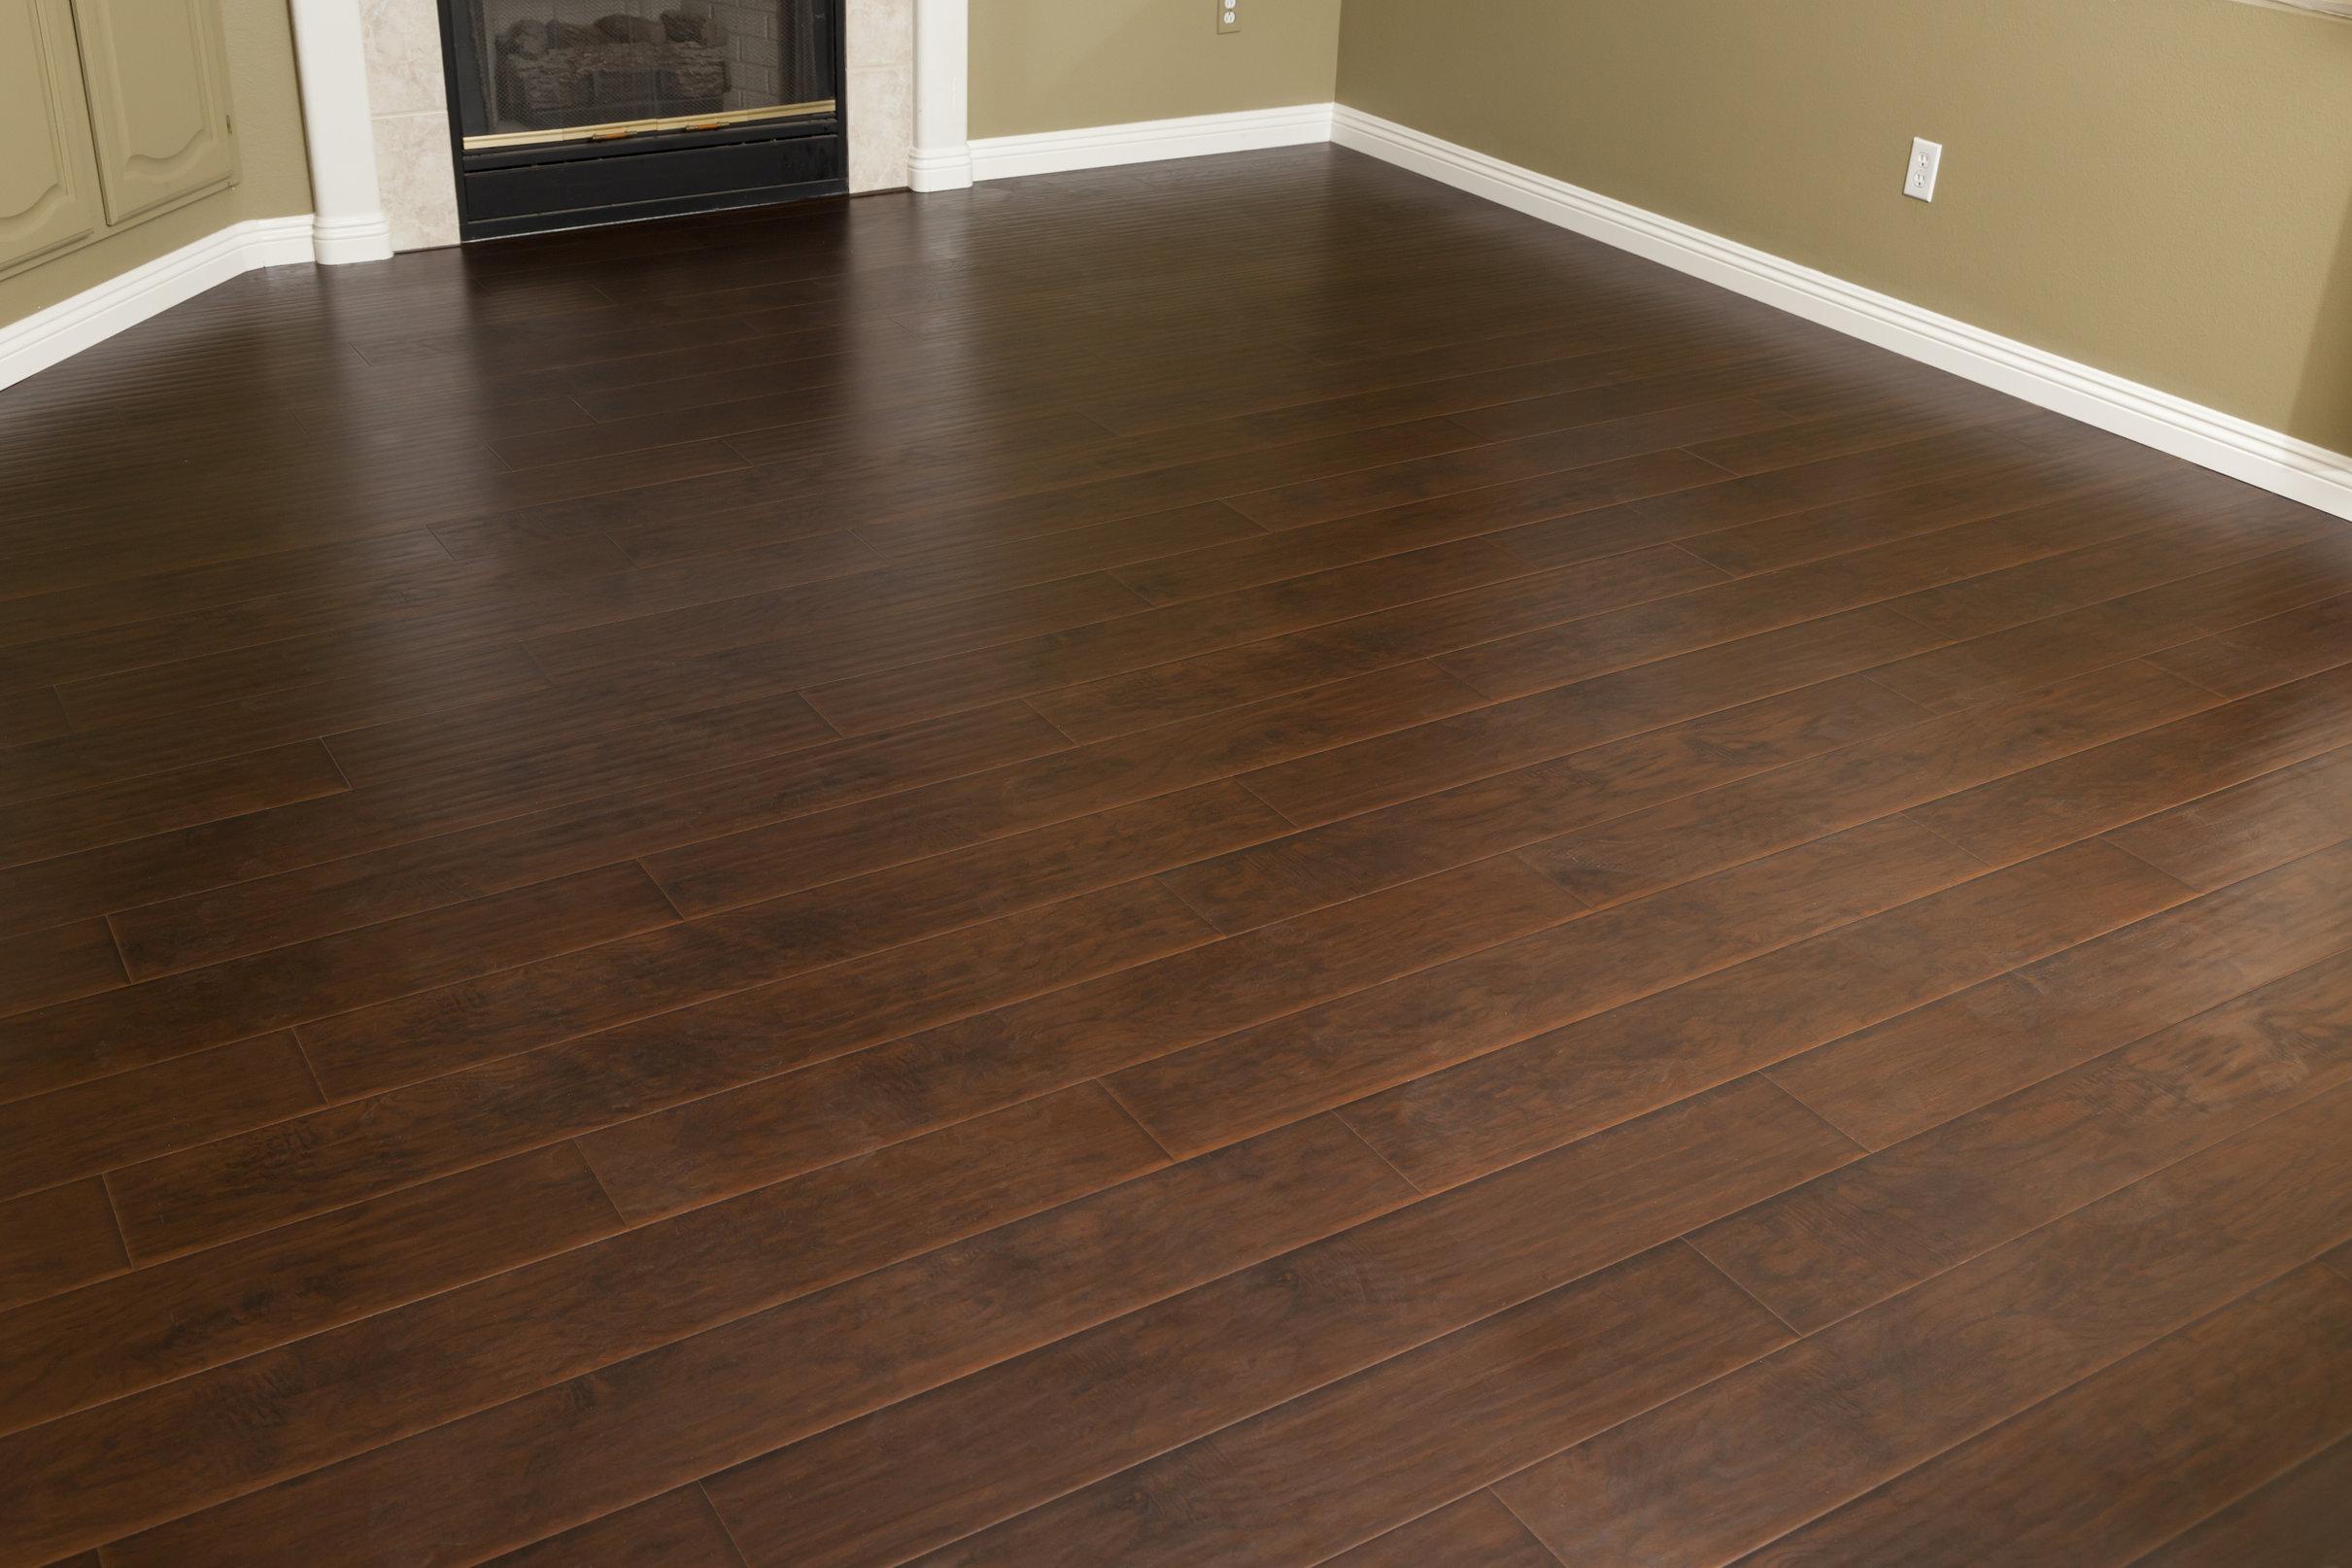 Laminate Flooring & Carpet Fitting